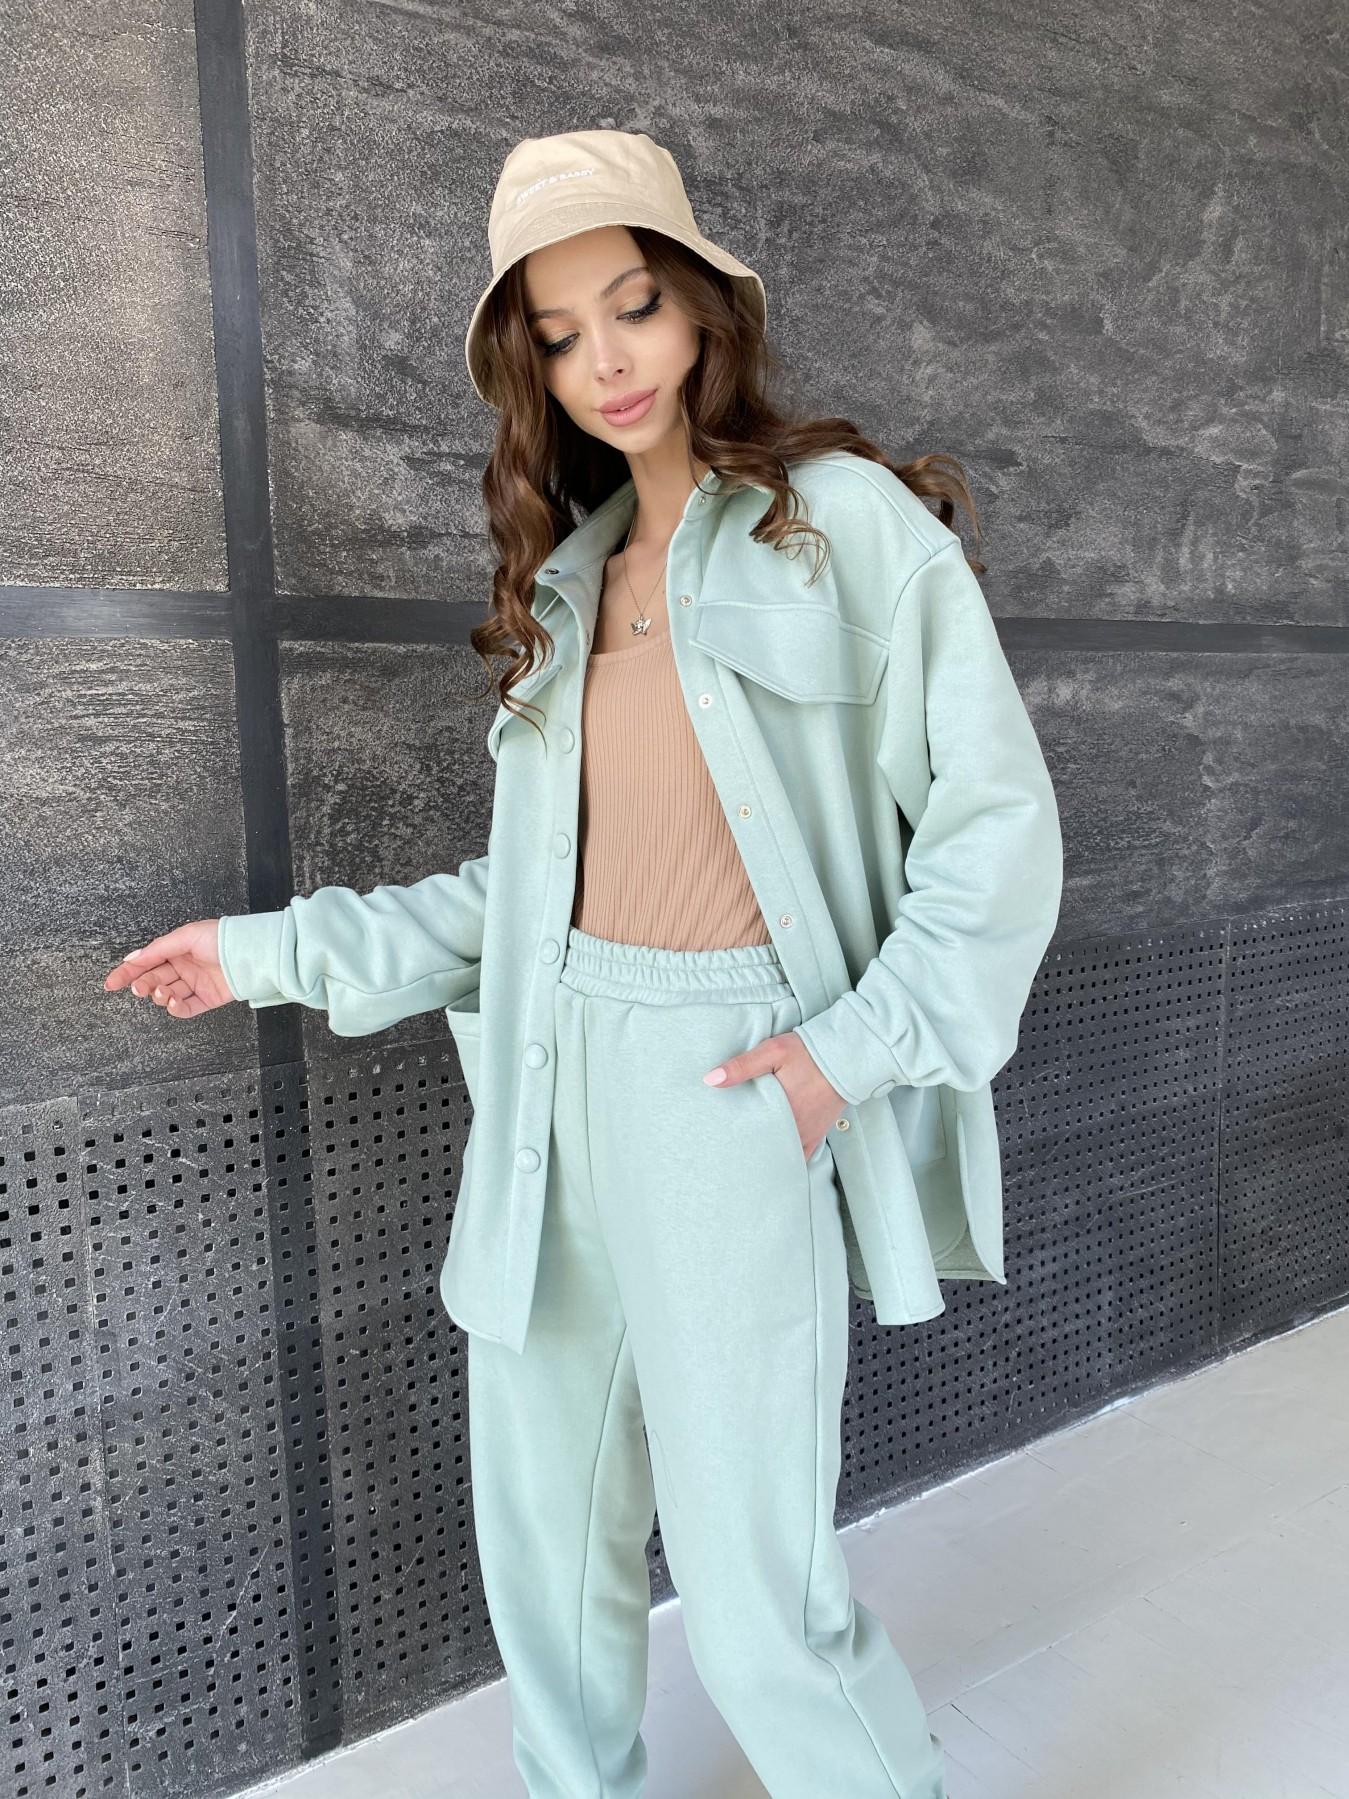 Респект костюм из трикотажа  3х нитка 11055 АРТ. 47576 Цвет: Олива Светлая - фото 2, интернет магазин tm-modus.ru